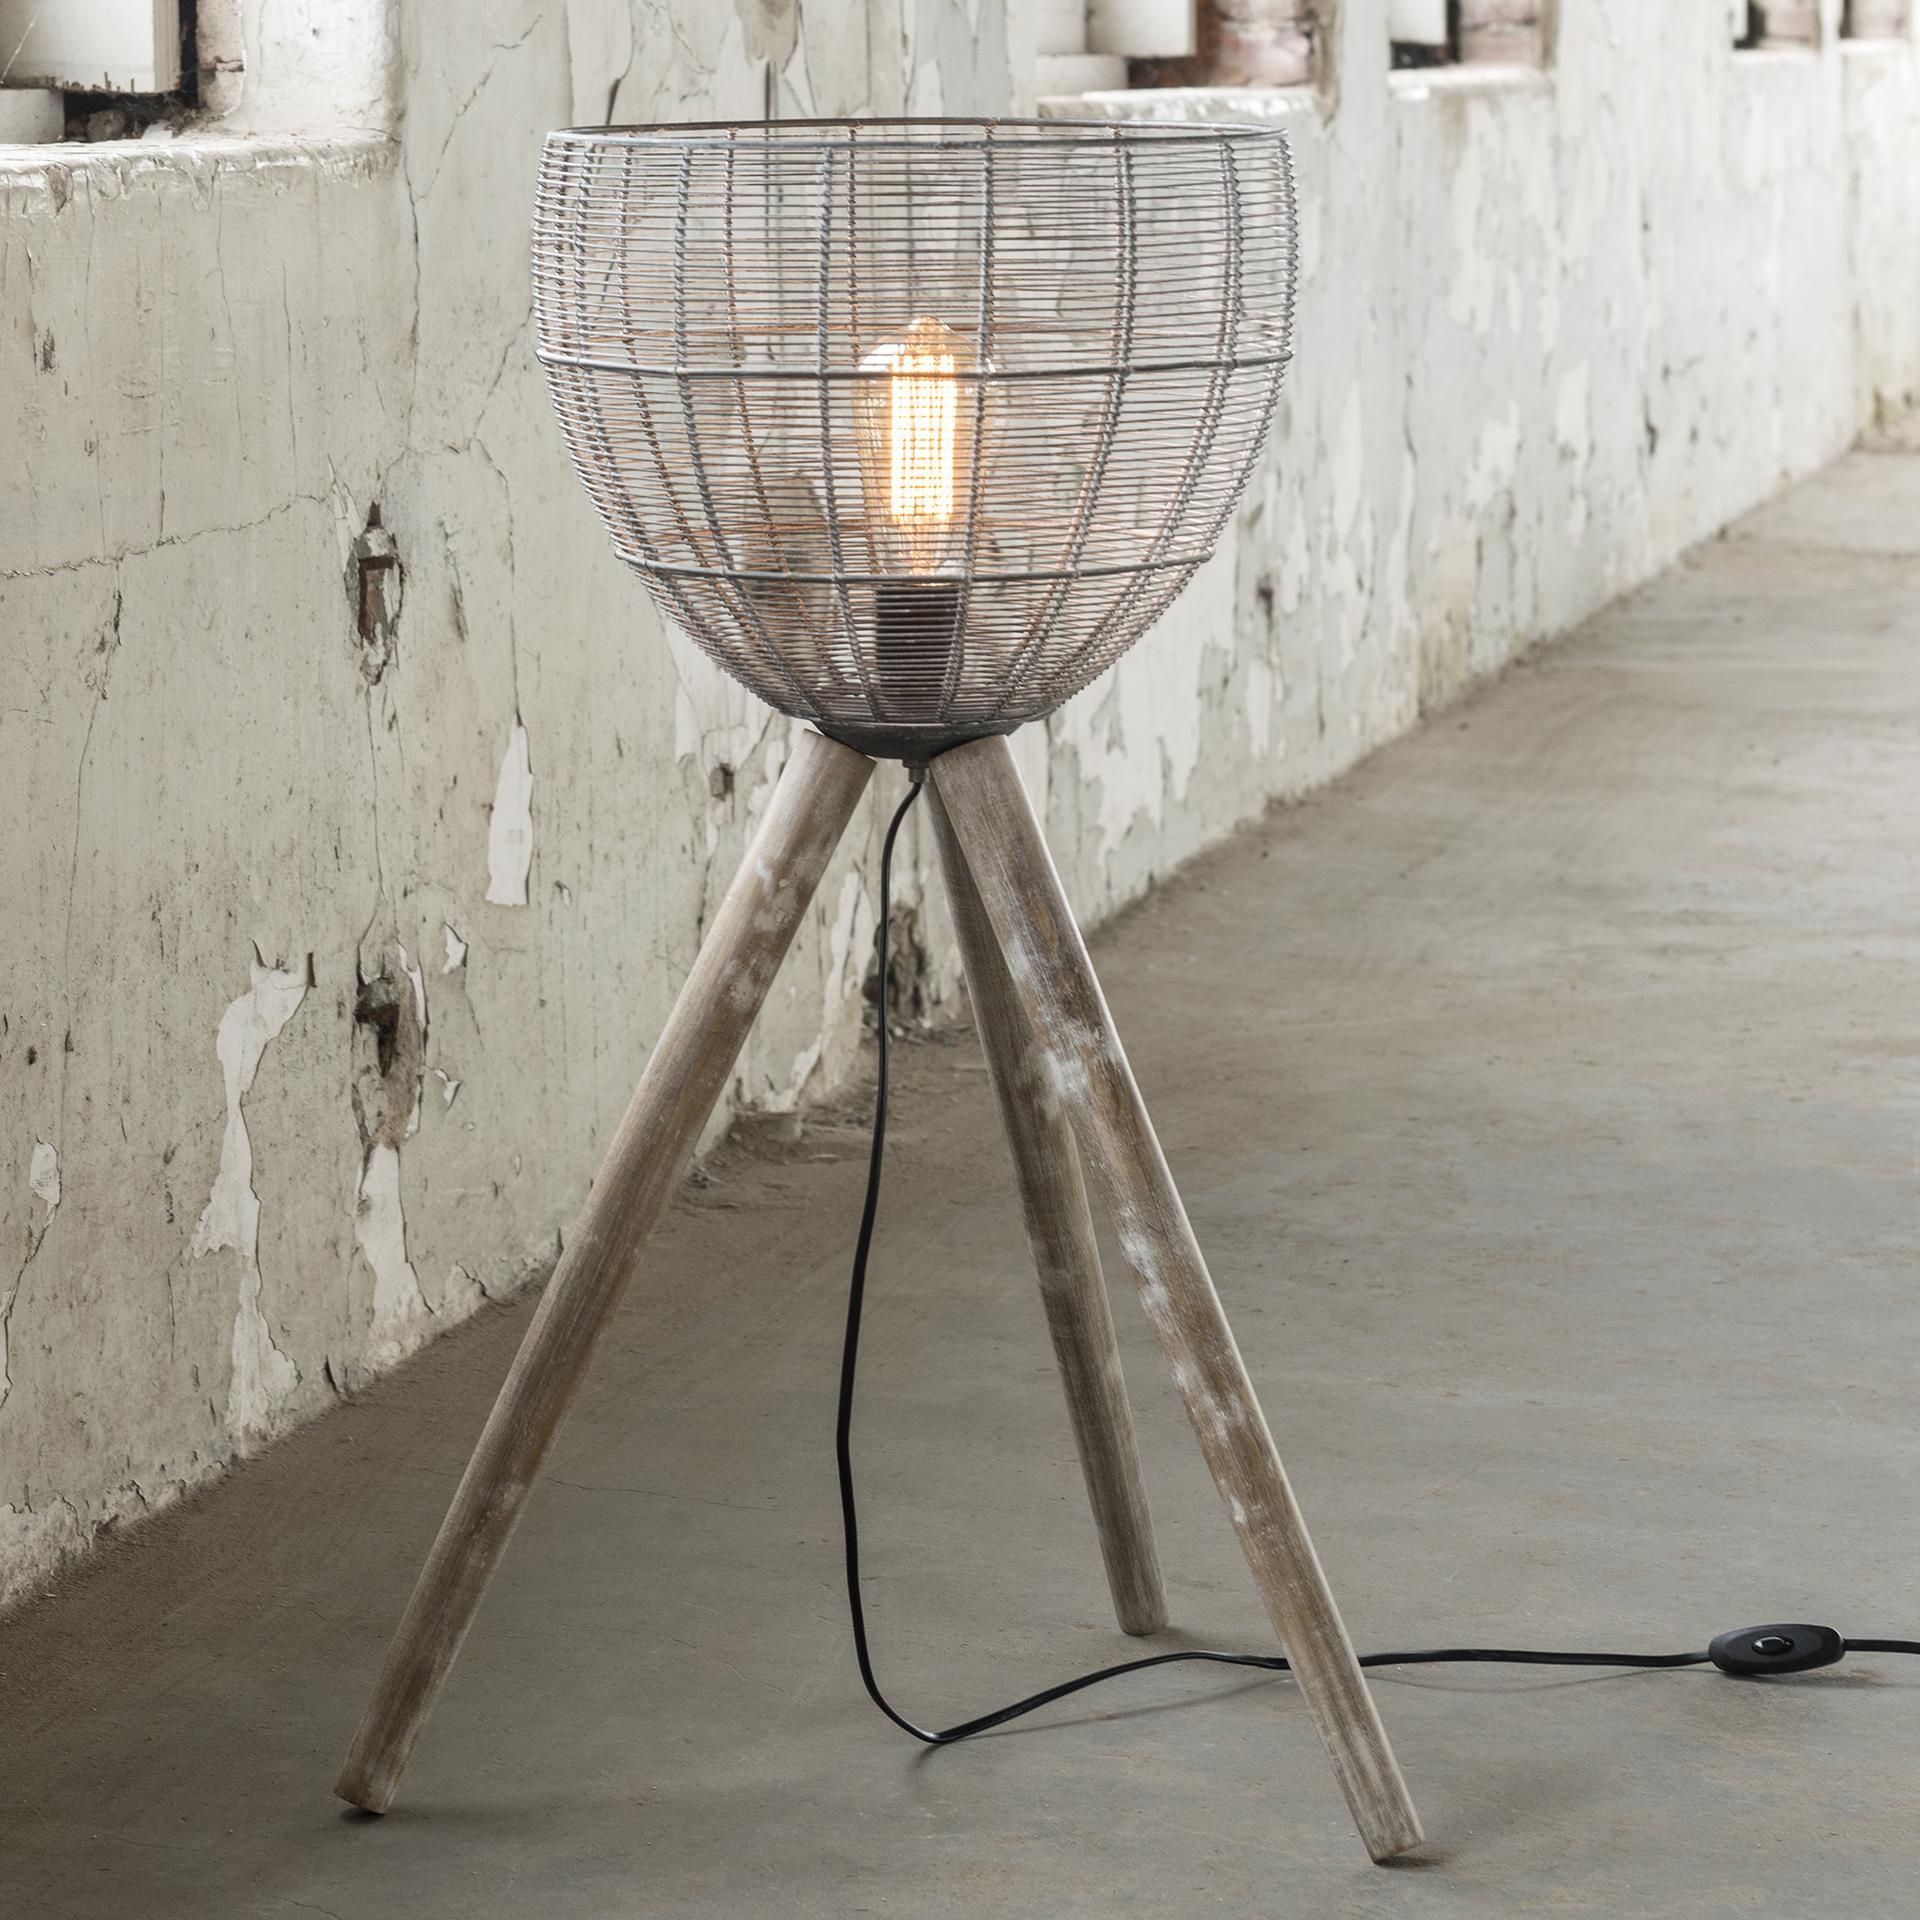 retro vloerlamp / tafellamp Clementine driepoot met korf